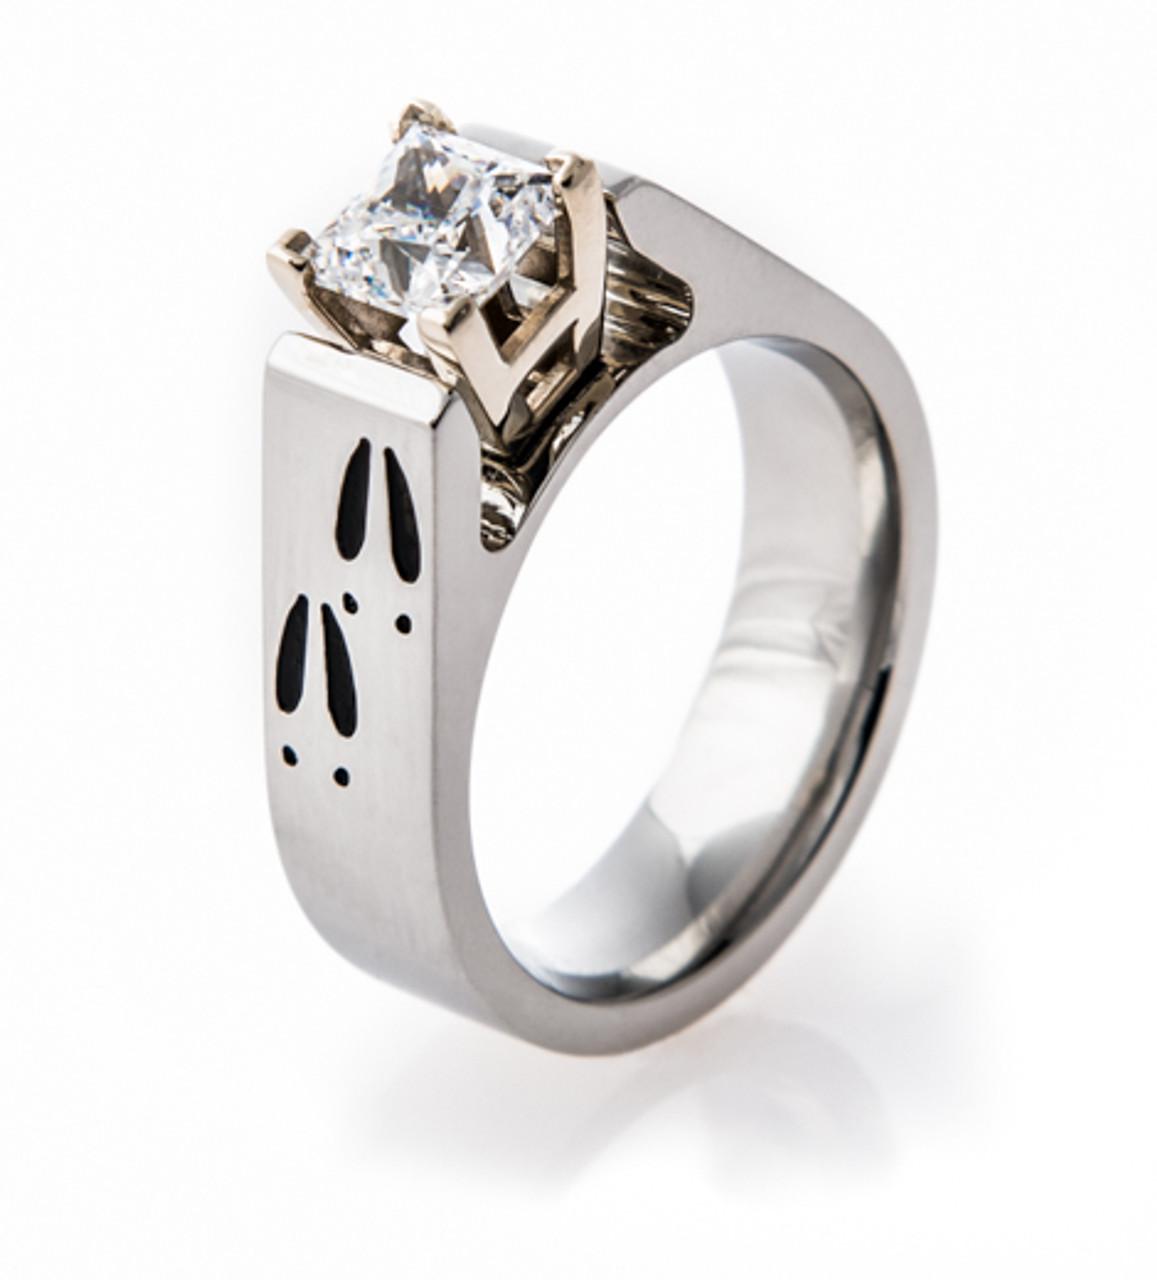 Cobalt Chrome Deer Track Wedding Rings Set Titanium Buzz